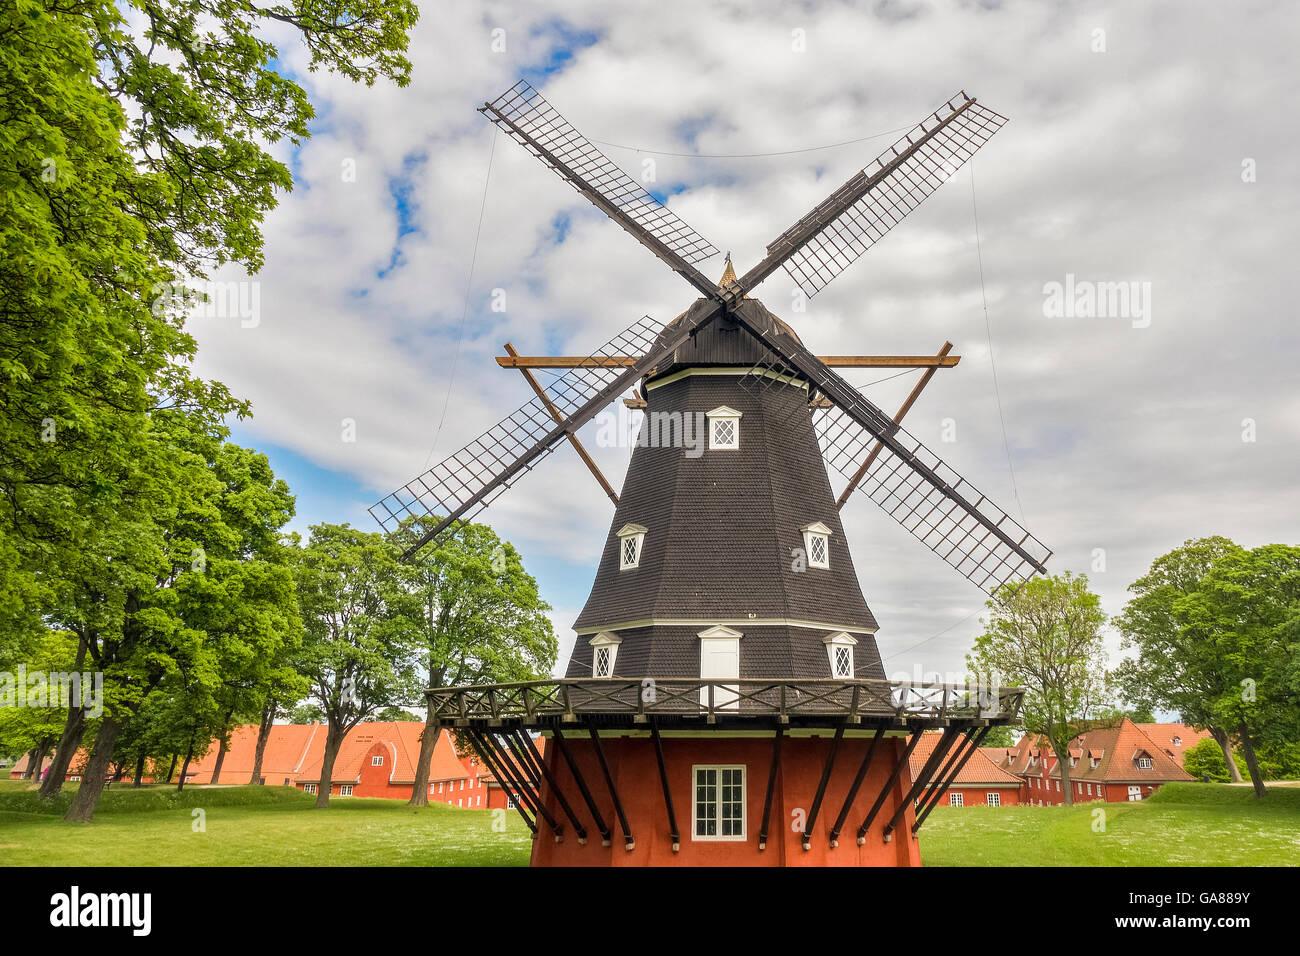 Windmill At The  Kastellet Fortress Copenhagen Denmark - Stock Image